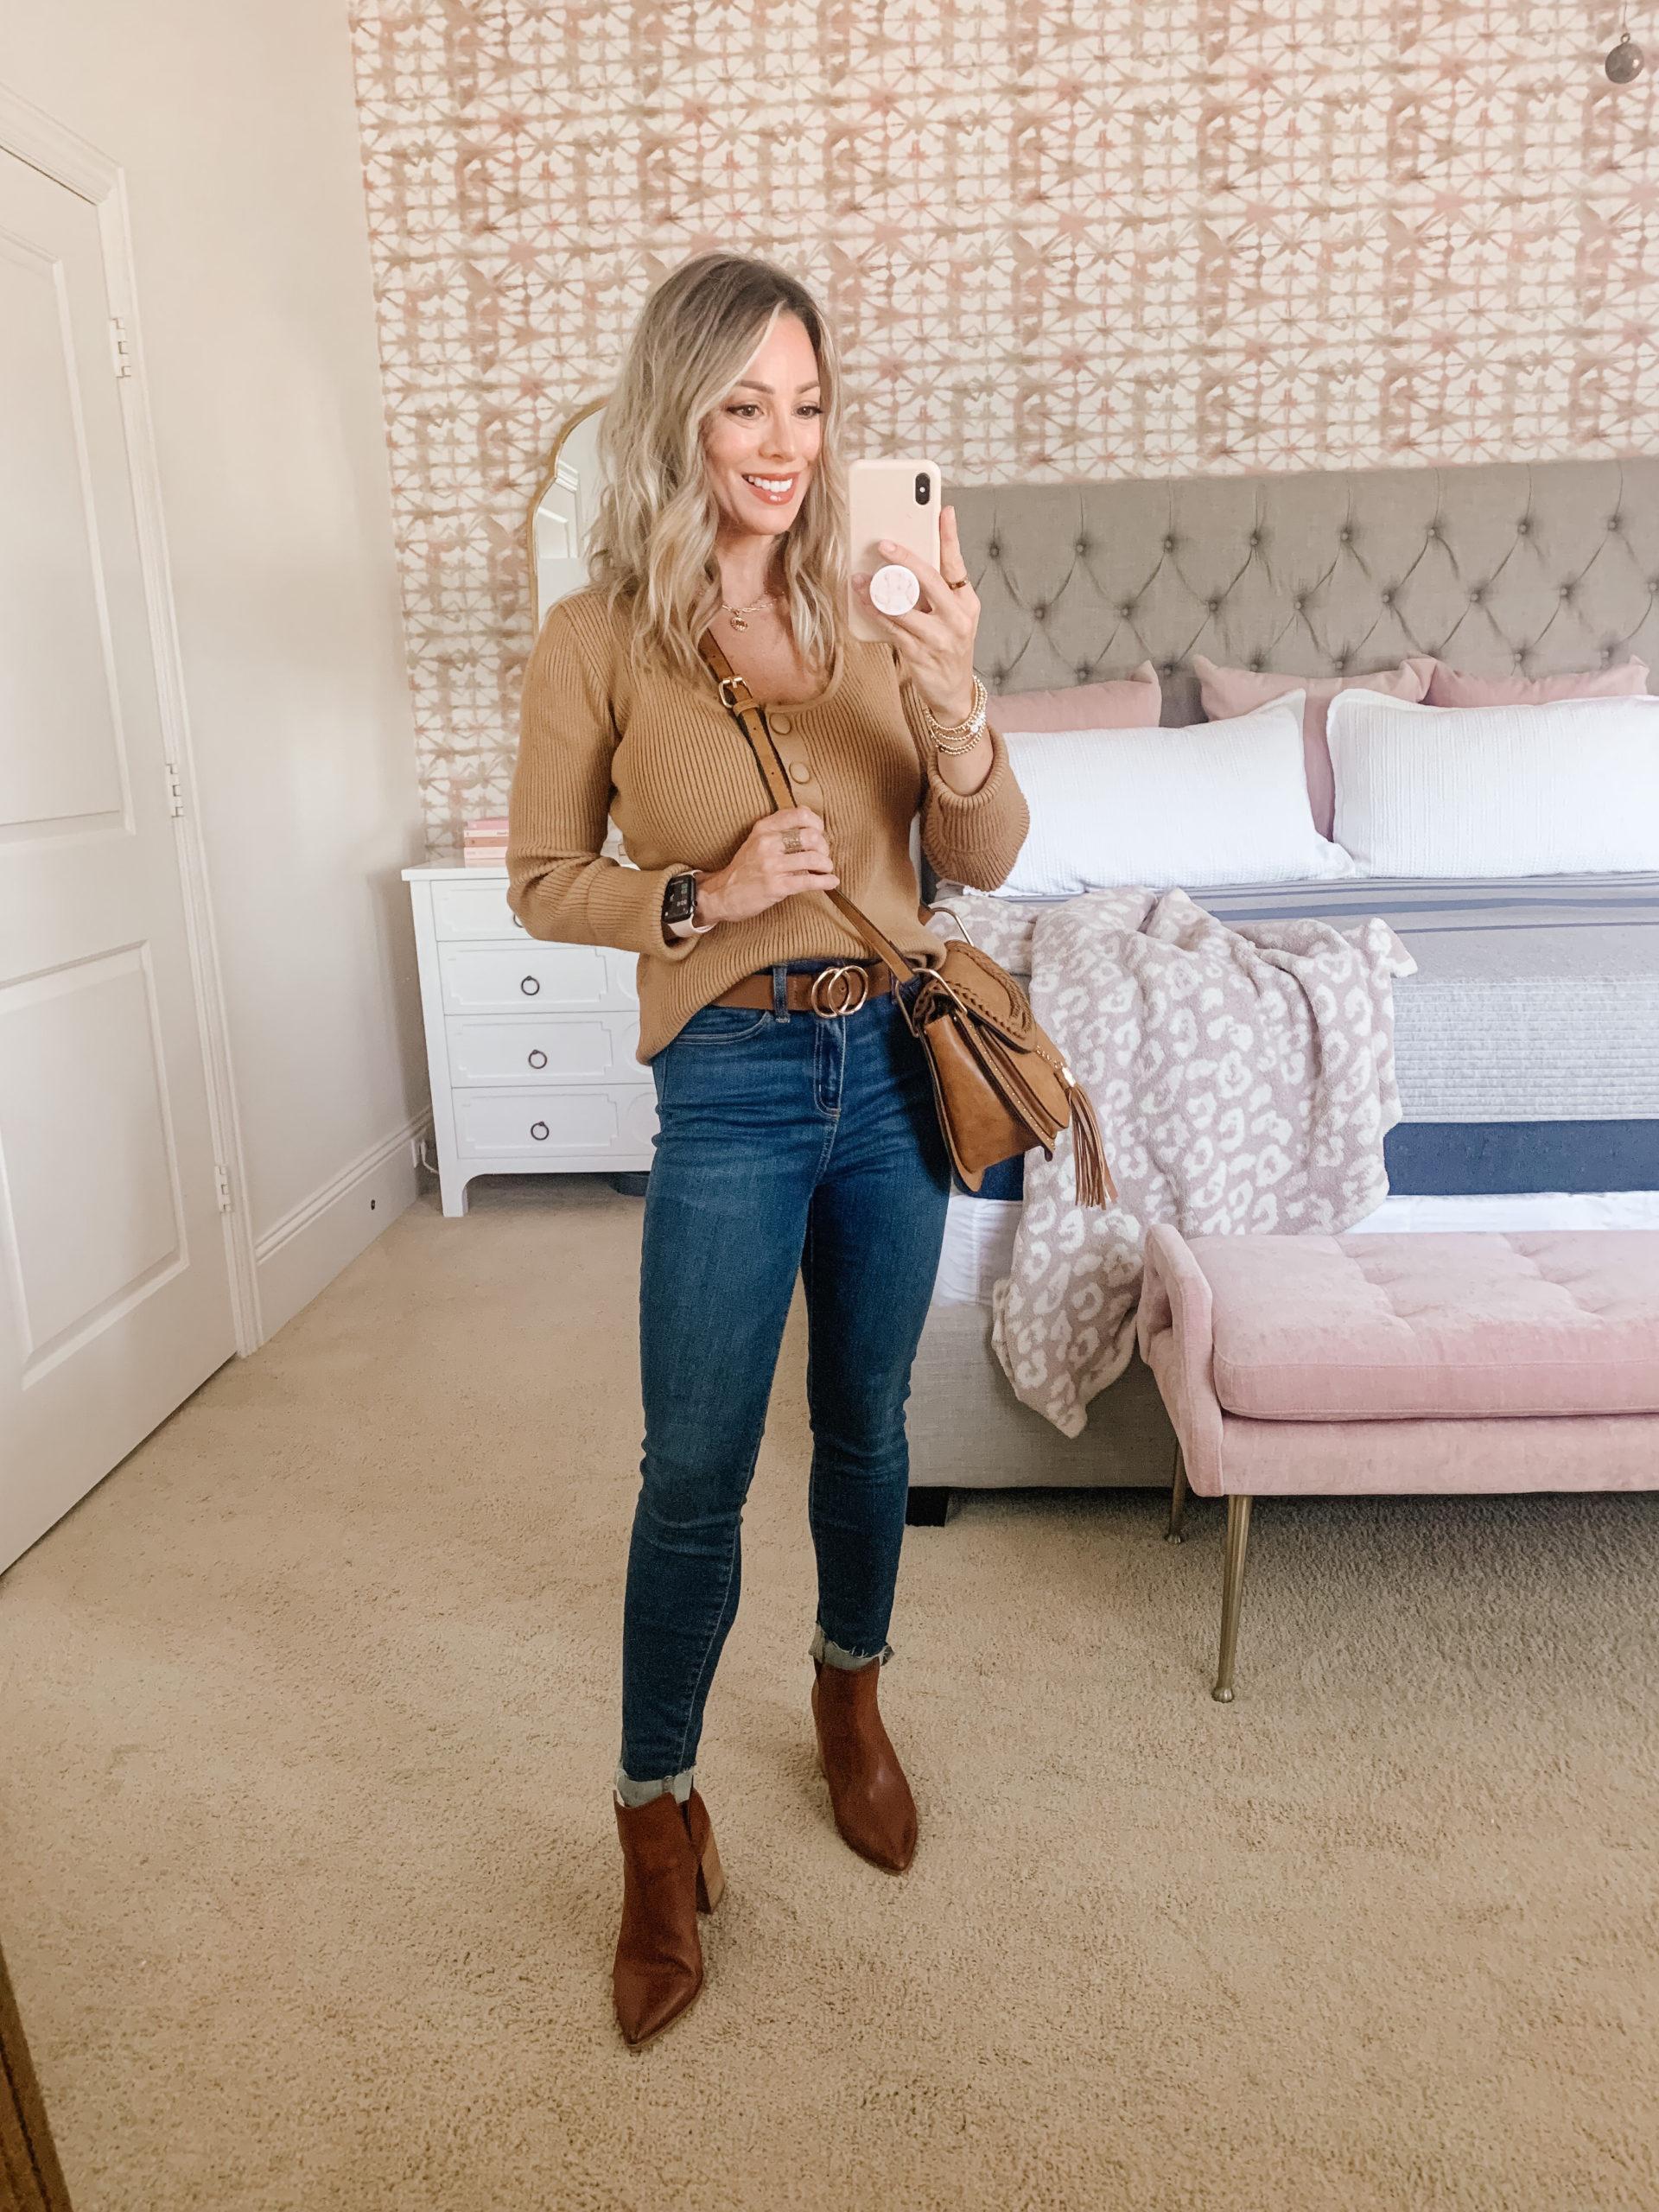 Amazon Fashion, Sweater, Jeans, Booties, Crossbody